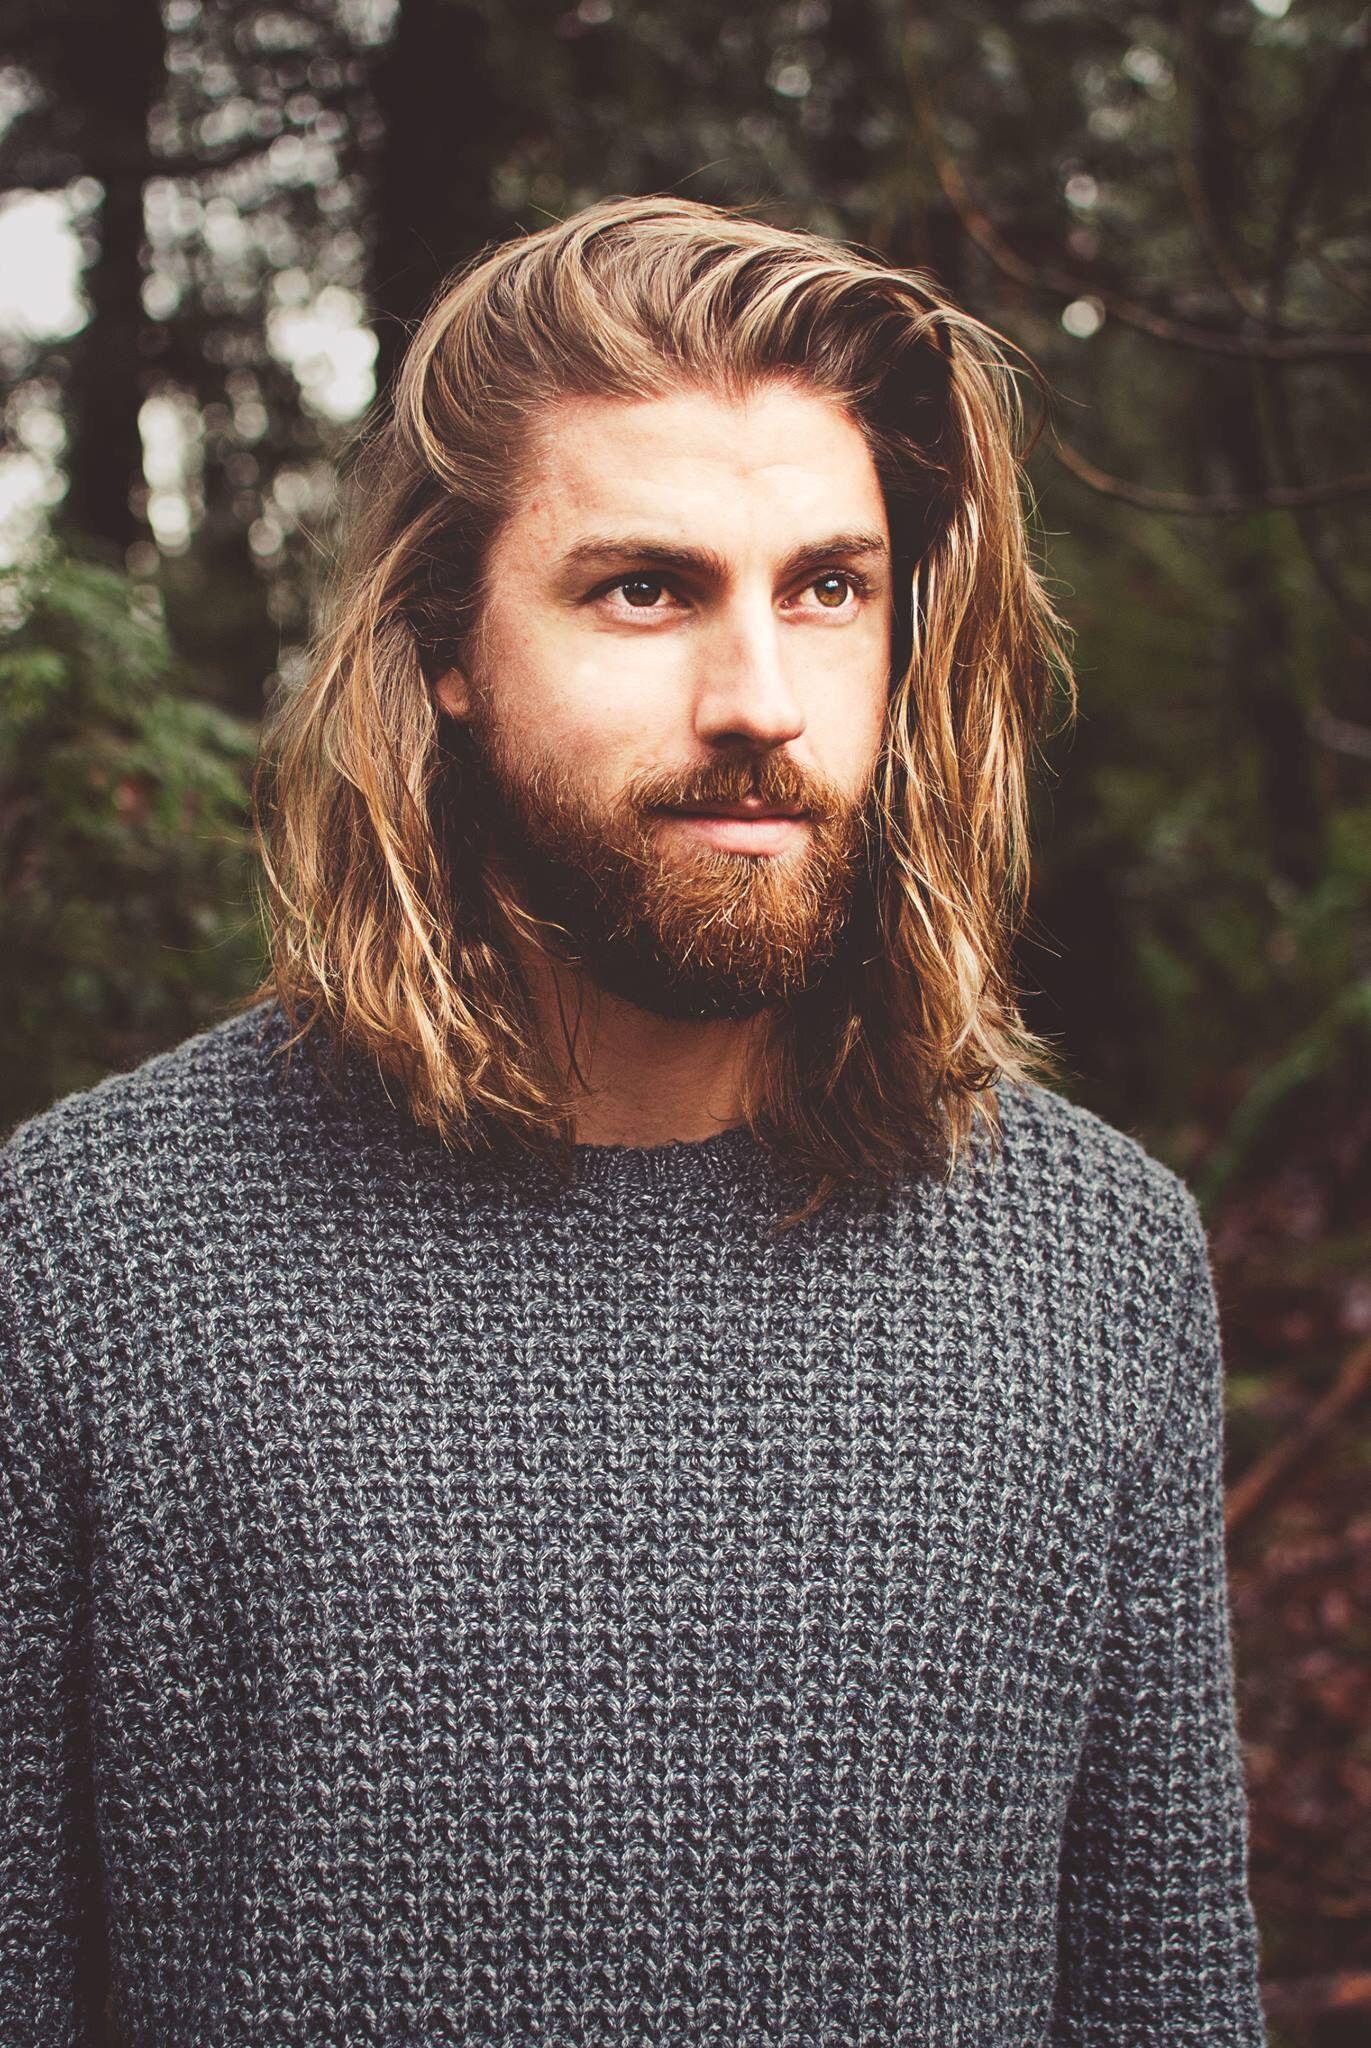 Npyynfa Jpg 1371 2048 Long Hair Beard Long Hair Styles Men Long Hair Styles